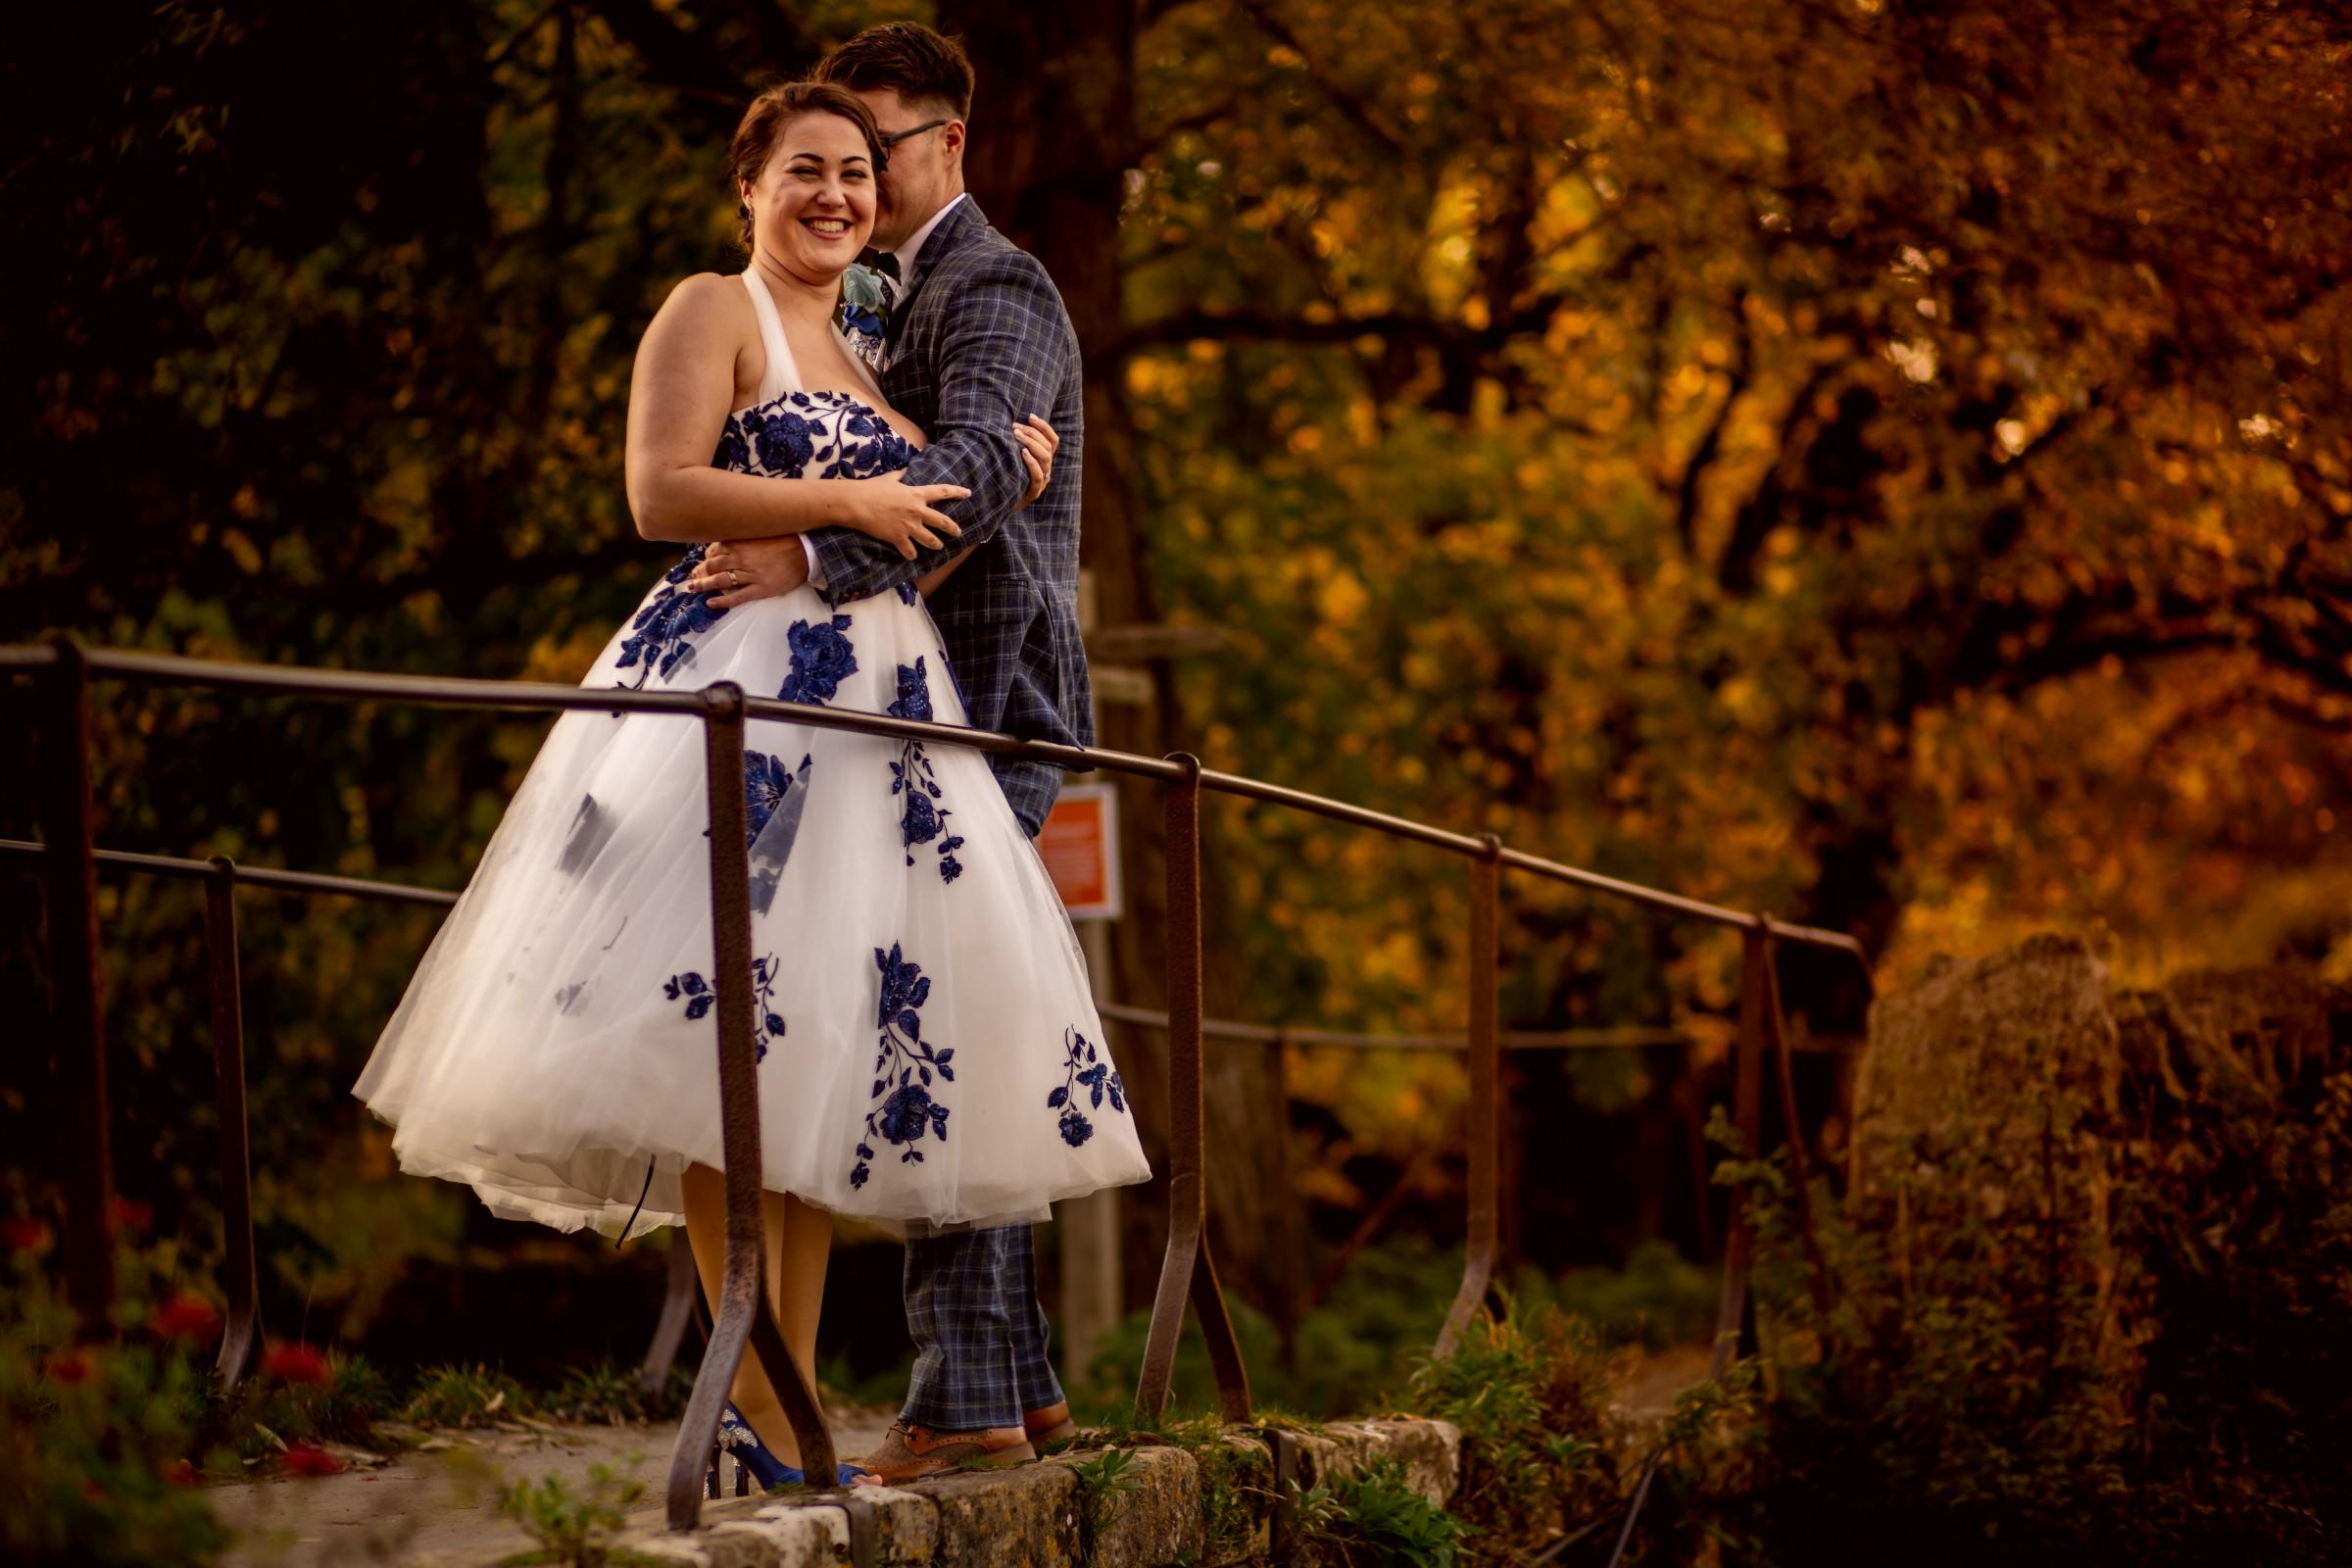 cotswolds wedding - creative wedding photography - unique wedding photoshoot